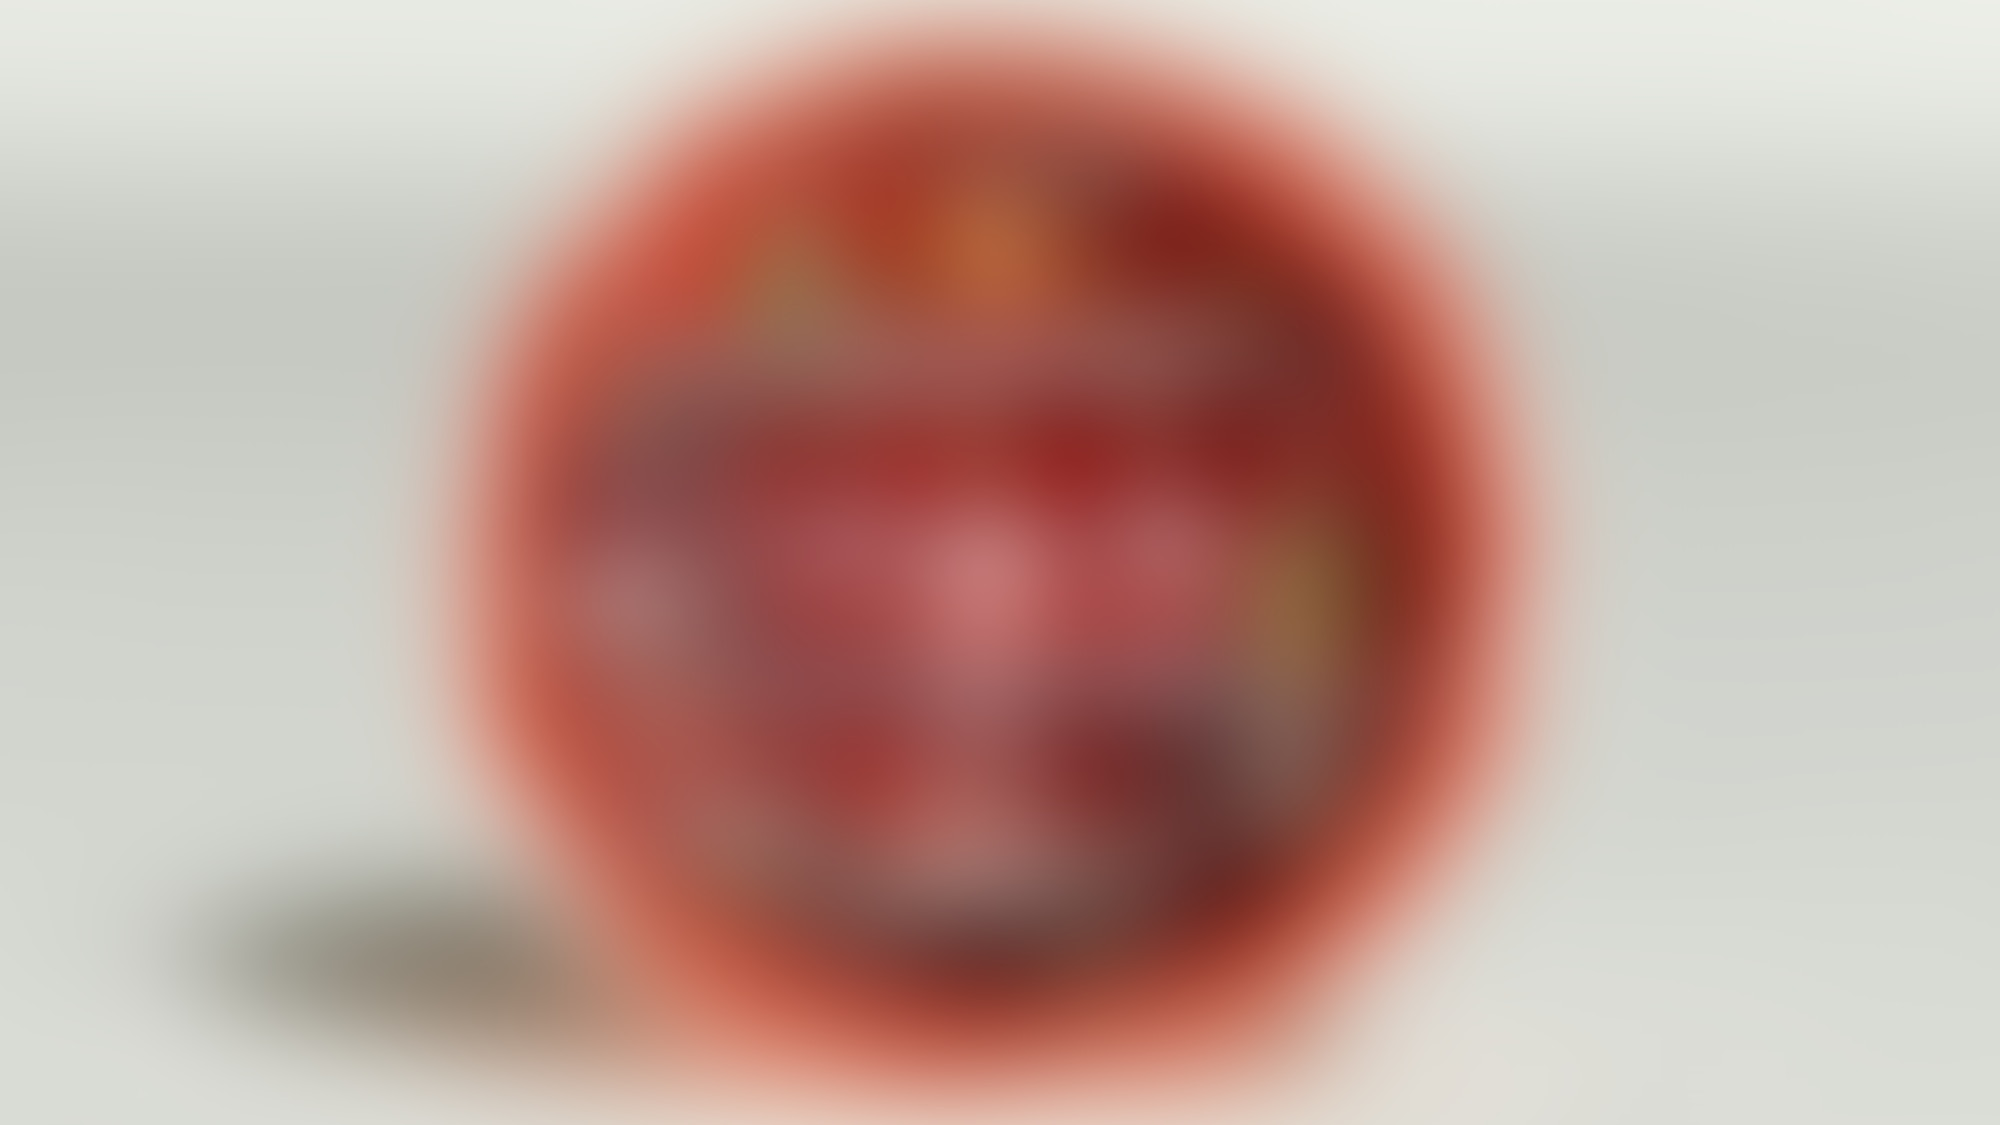 5 Fruit Pastille Design v03 autocompressfitresizeixlibphp 1 1 0max h2000max w3 D2000q80s2eeacbb390e37a7db39c36f4c305d3b9